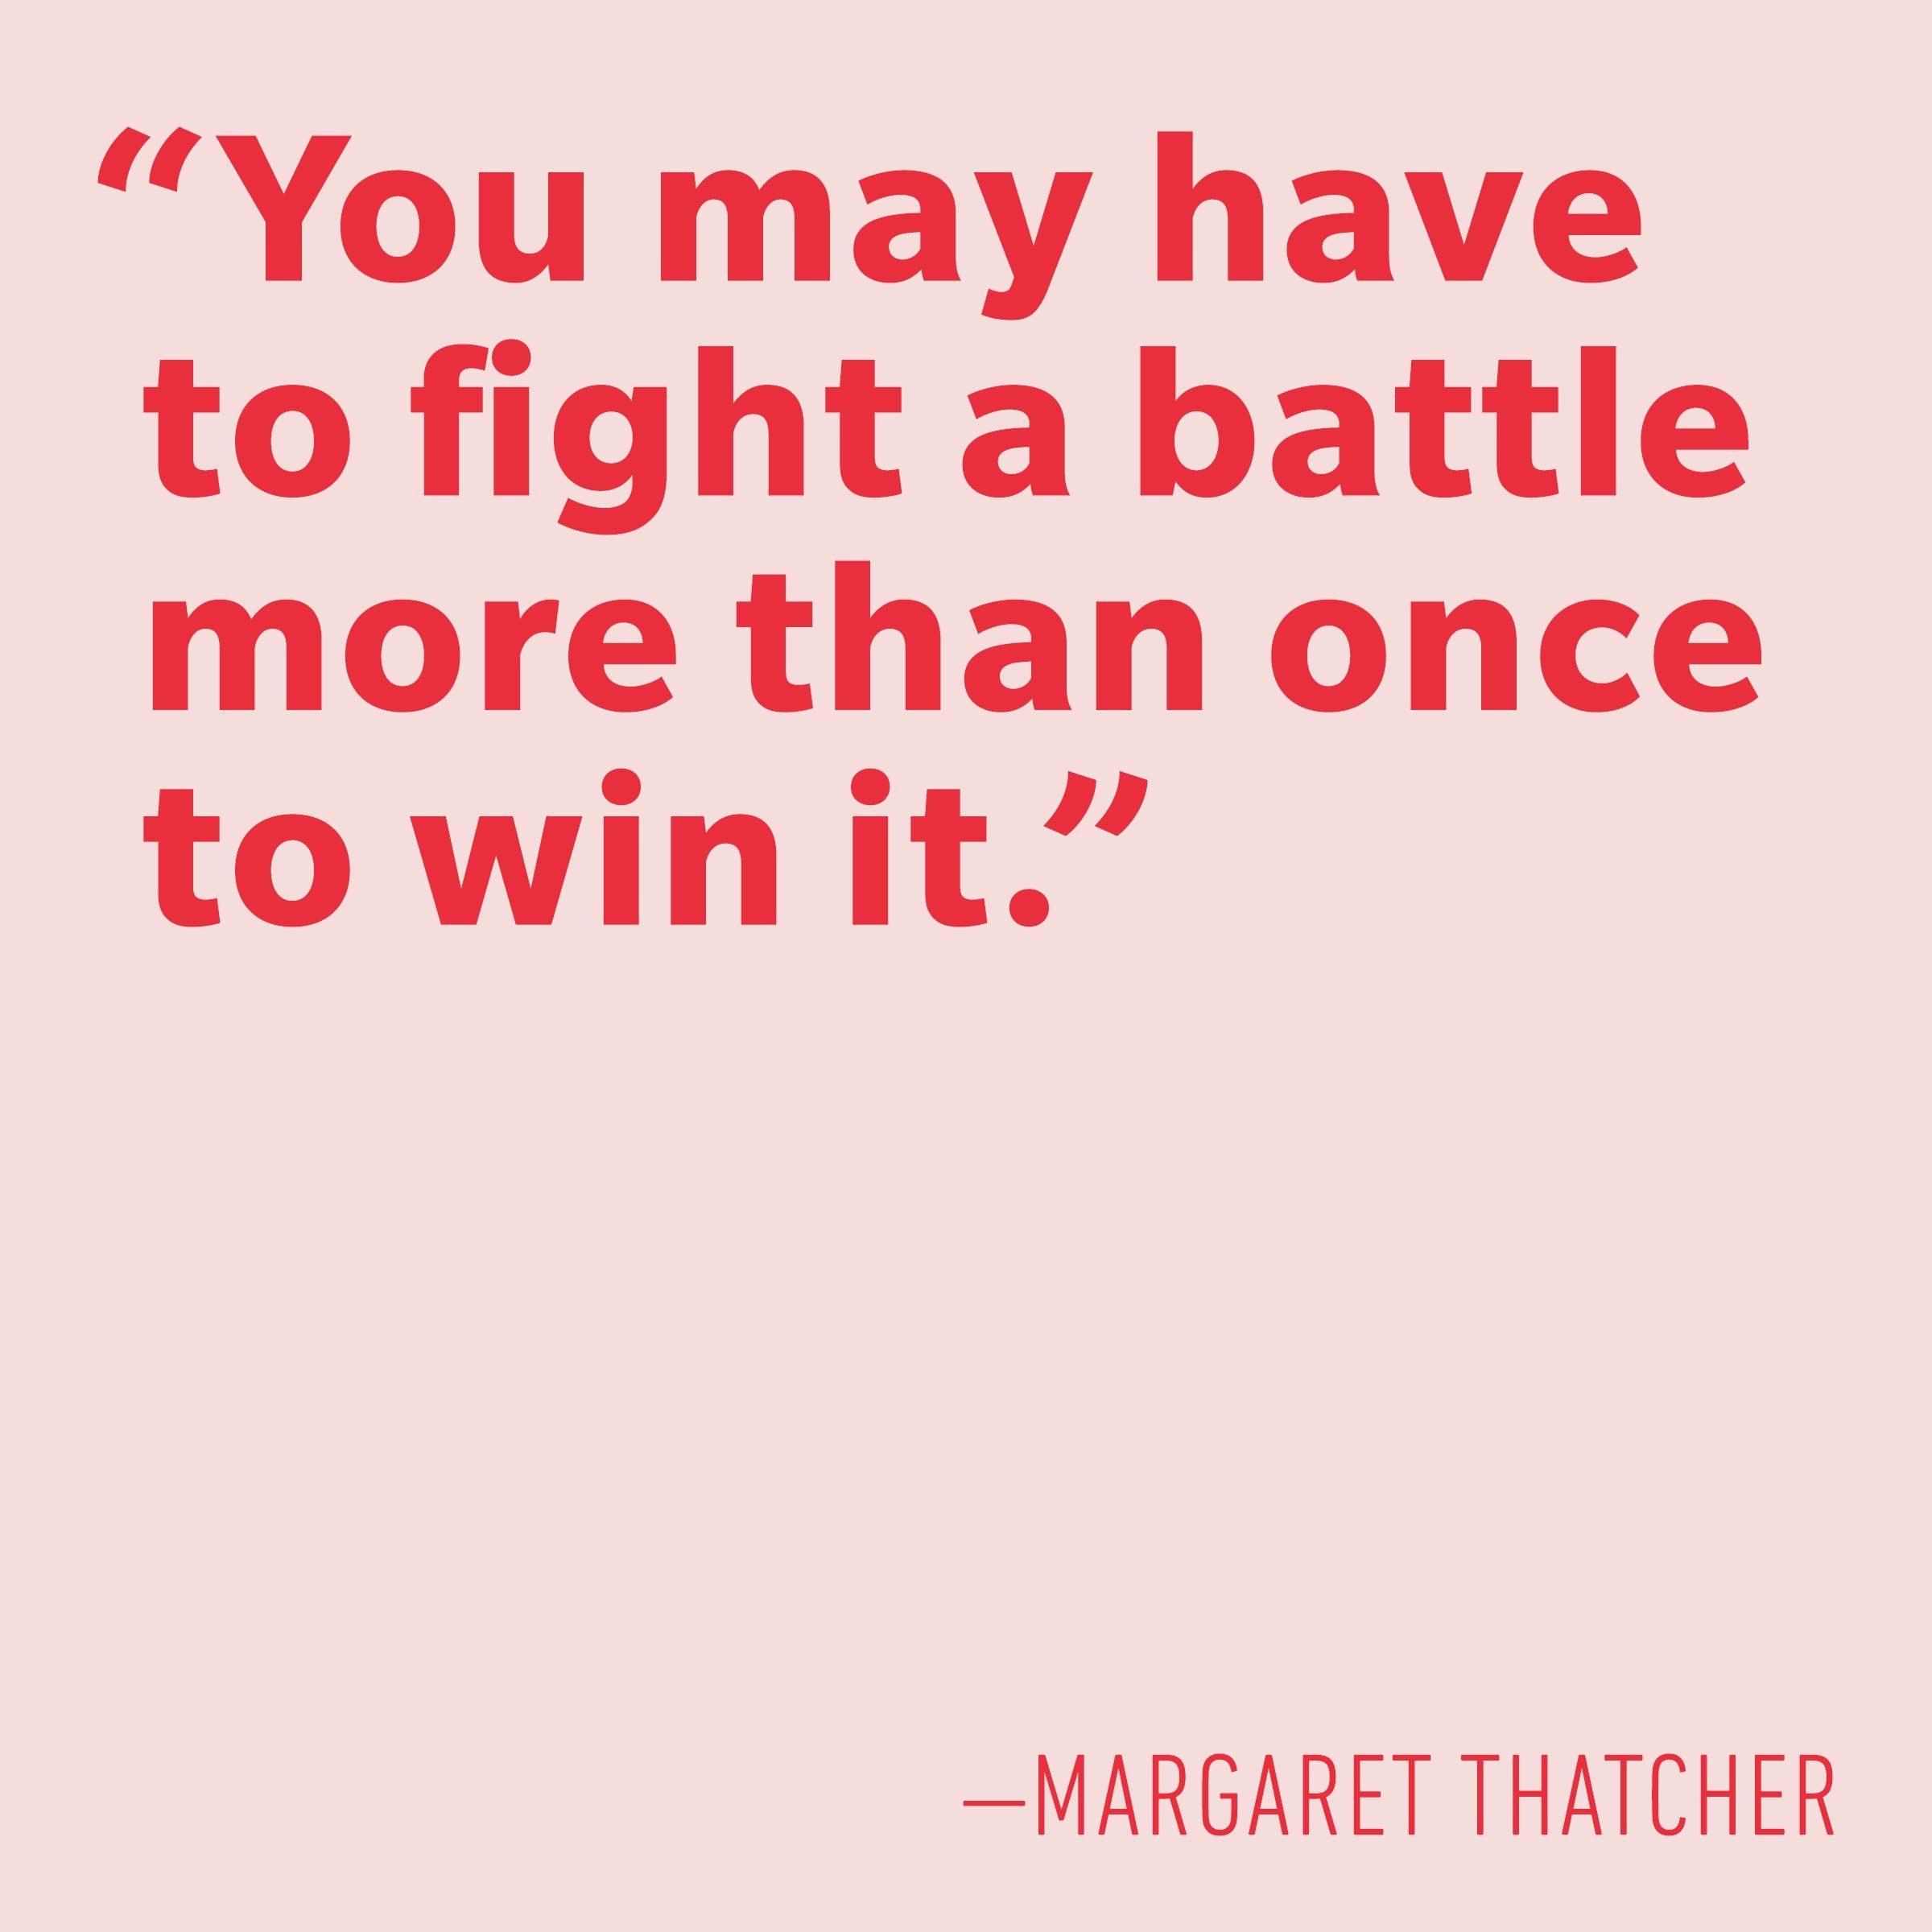 Motivational quotes - Margaret Thatcher